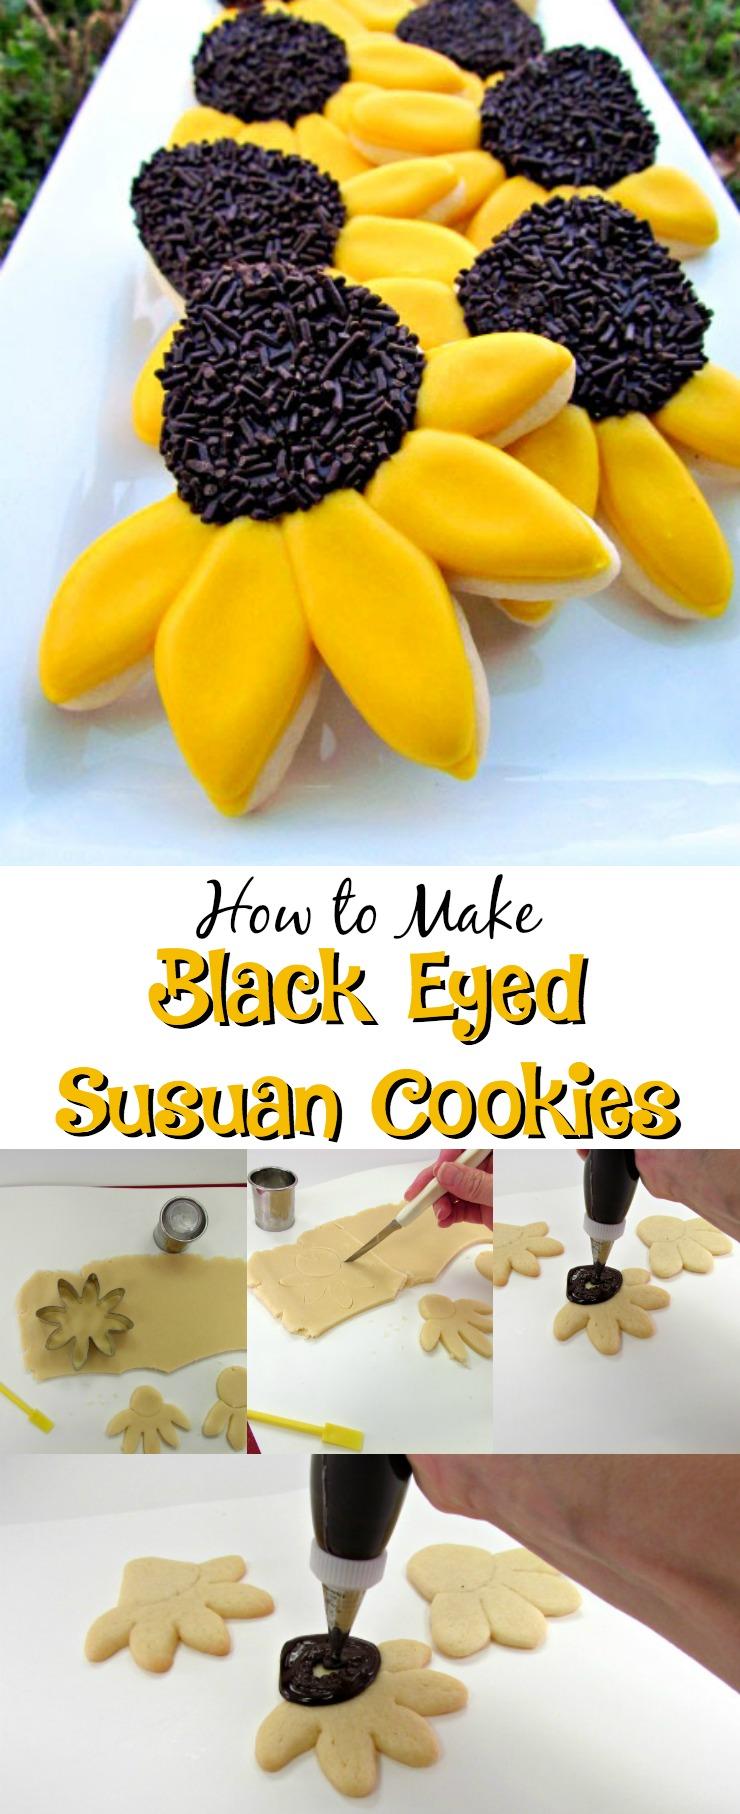 How to Make Black Eyed Susan Cookies via www.thebearfootbaker.com